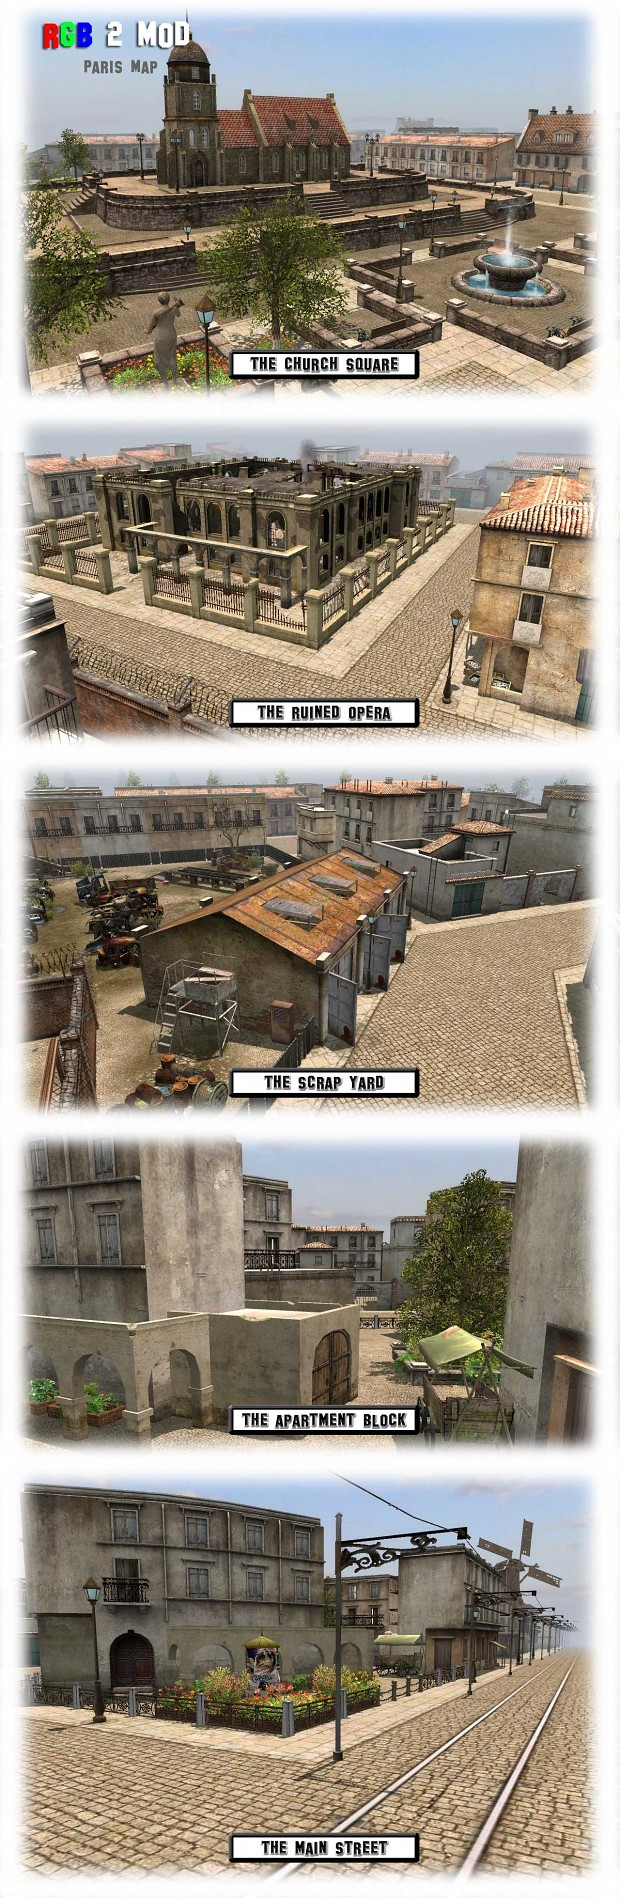 RGB2 Mod Paris Level